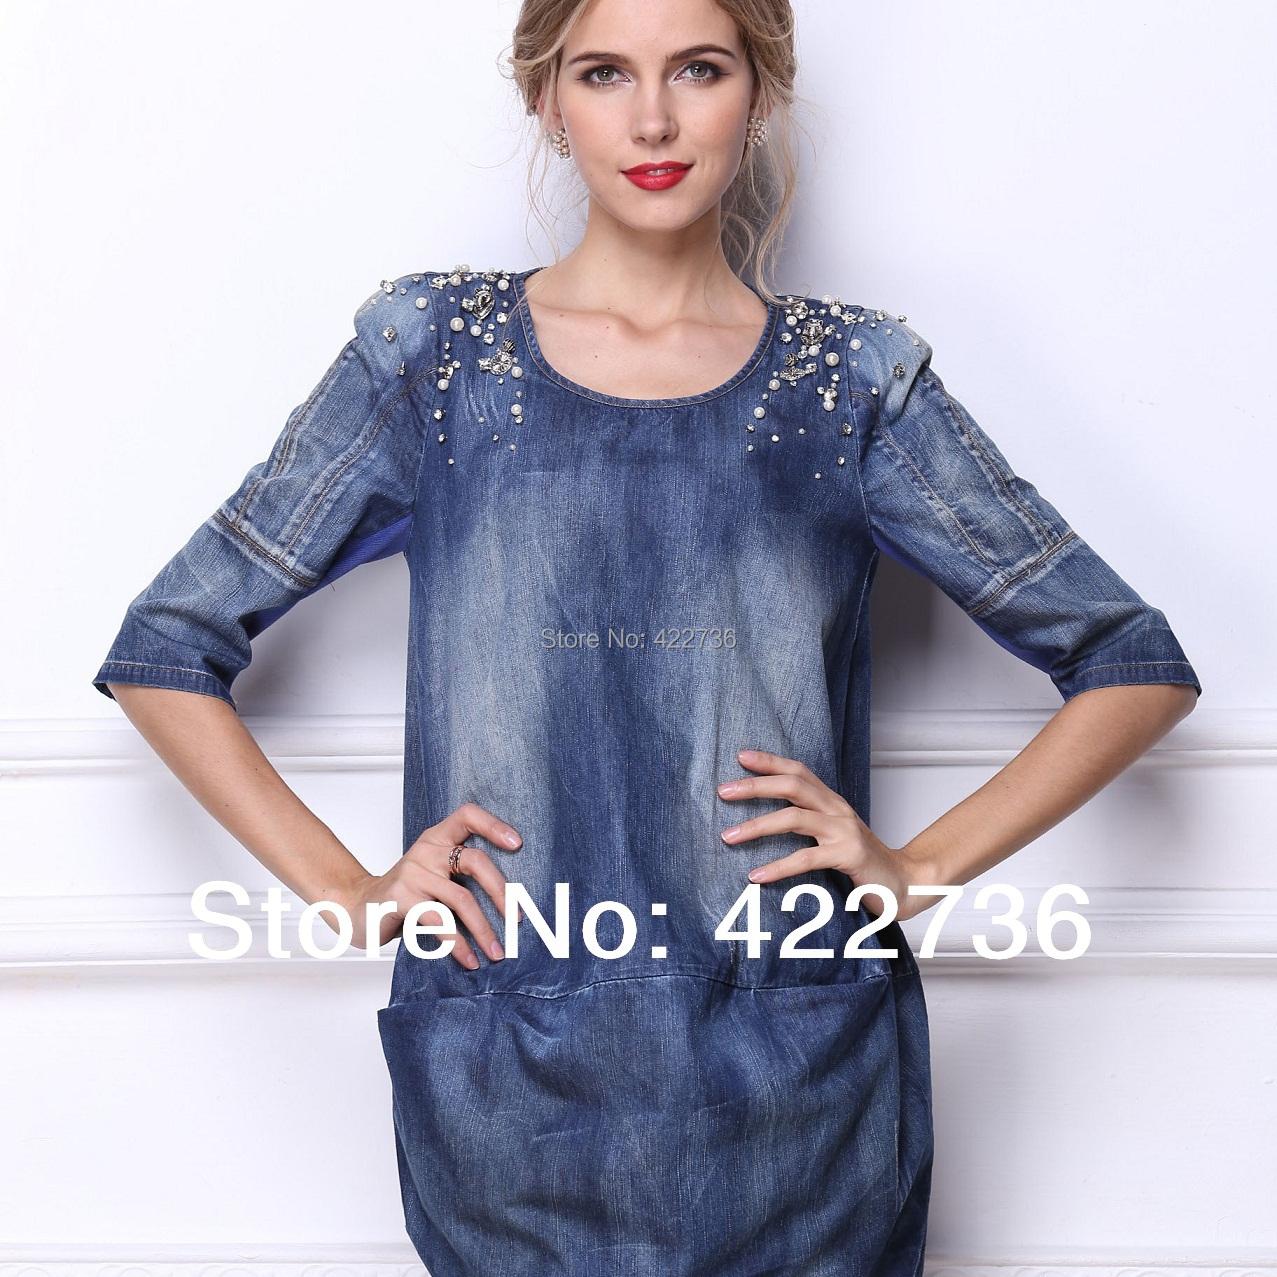 Brand! Plus size M- 4XL 5XL 6XL new 2015 summer autumn women fashion high-end jean clothes woman loose runway denim mini dress - Mary Fashion Large Size Clothing Store ( S-10XL store)